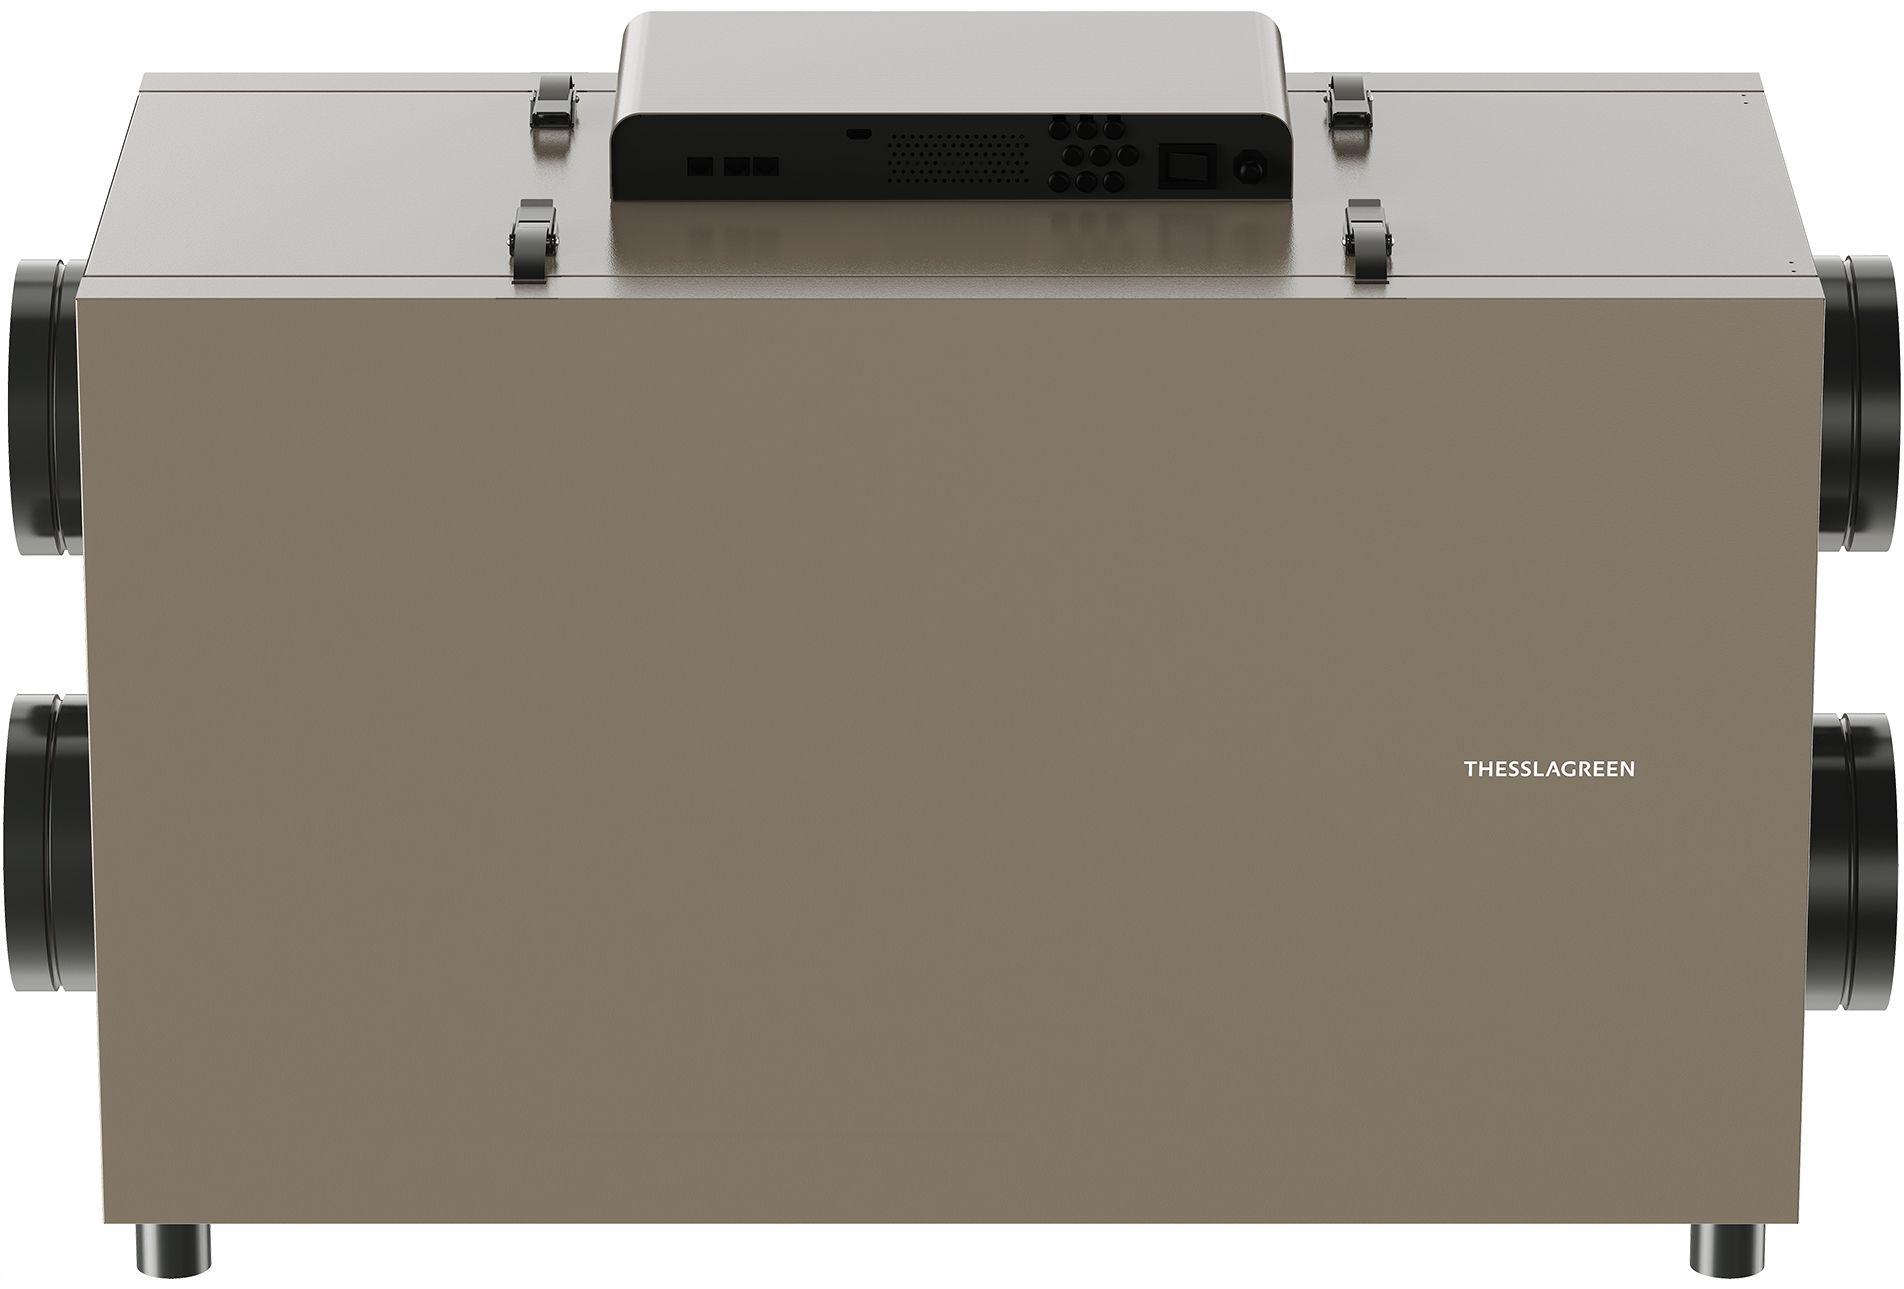 Rekuperator Thessla AP Home 500h Energy+ montaż Centrala wentylacyjna AirPack Thessla 500h Energy+